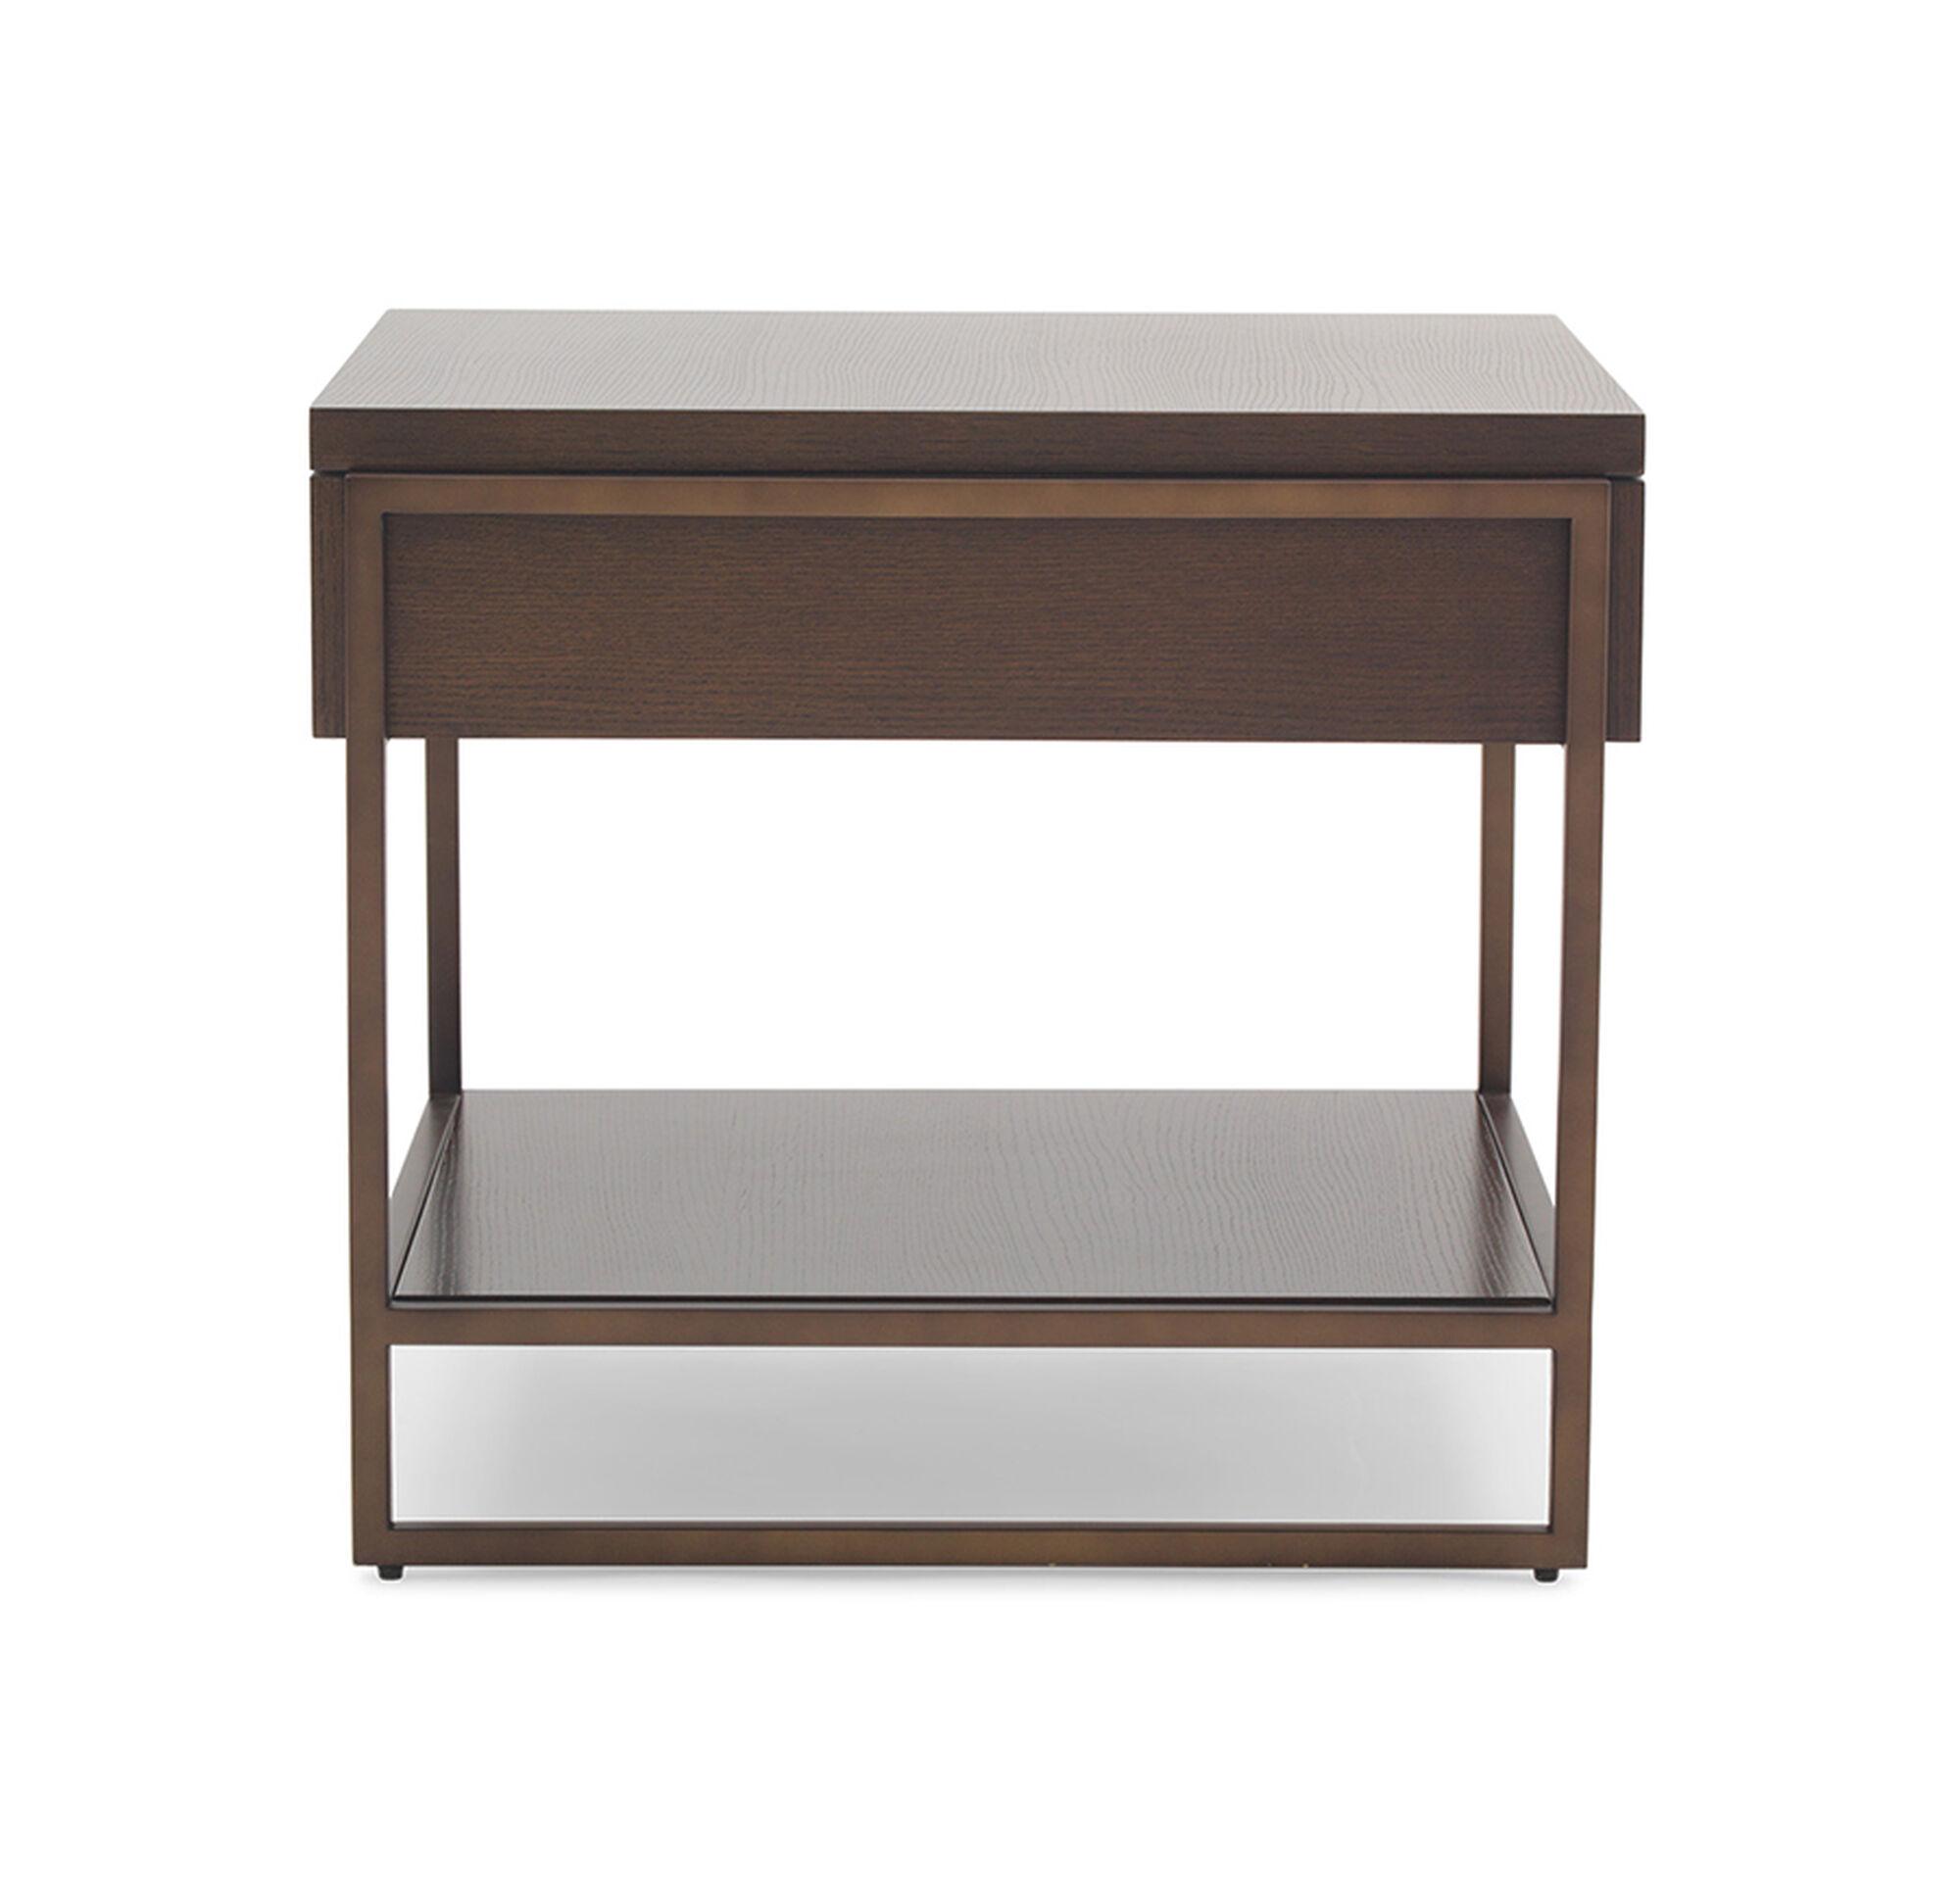 drawers opul drawer solid side loris bedside table decoration oak